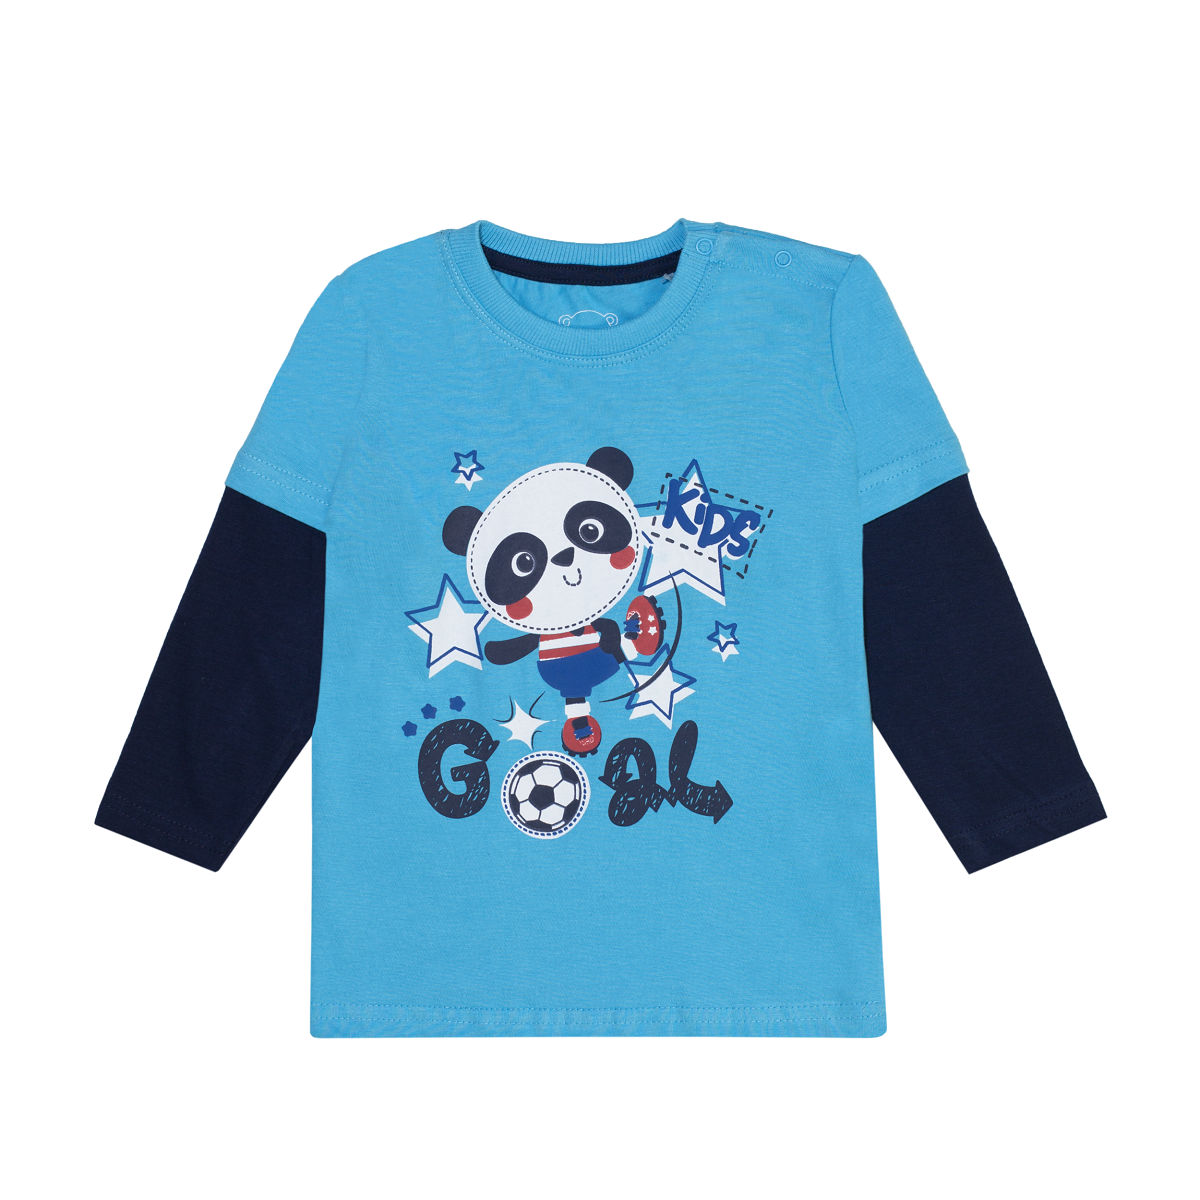 Baby majica, svetlo modra